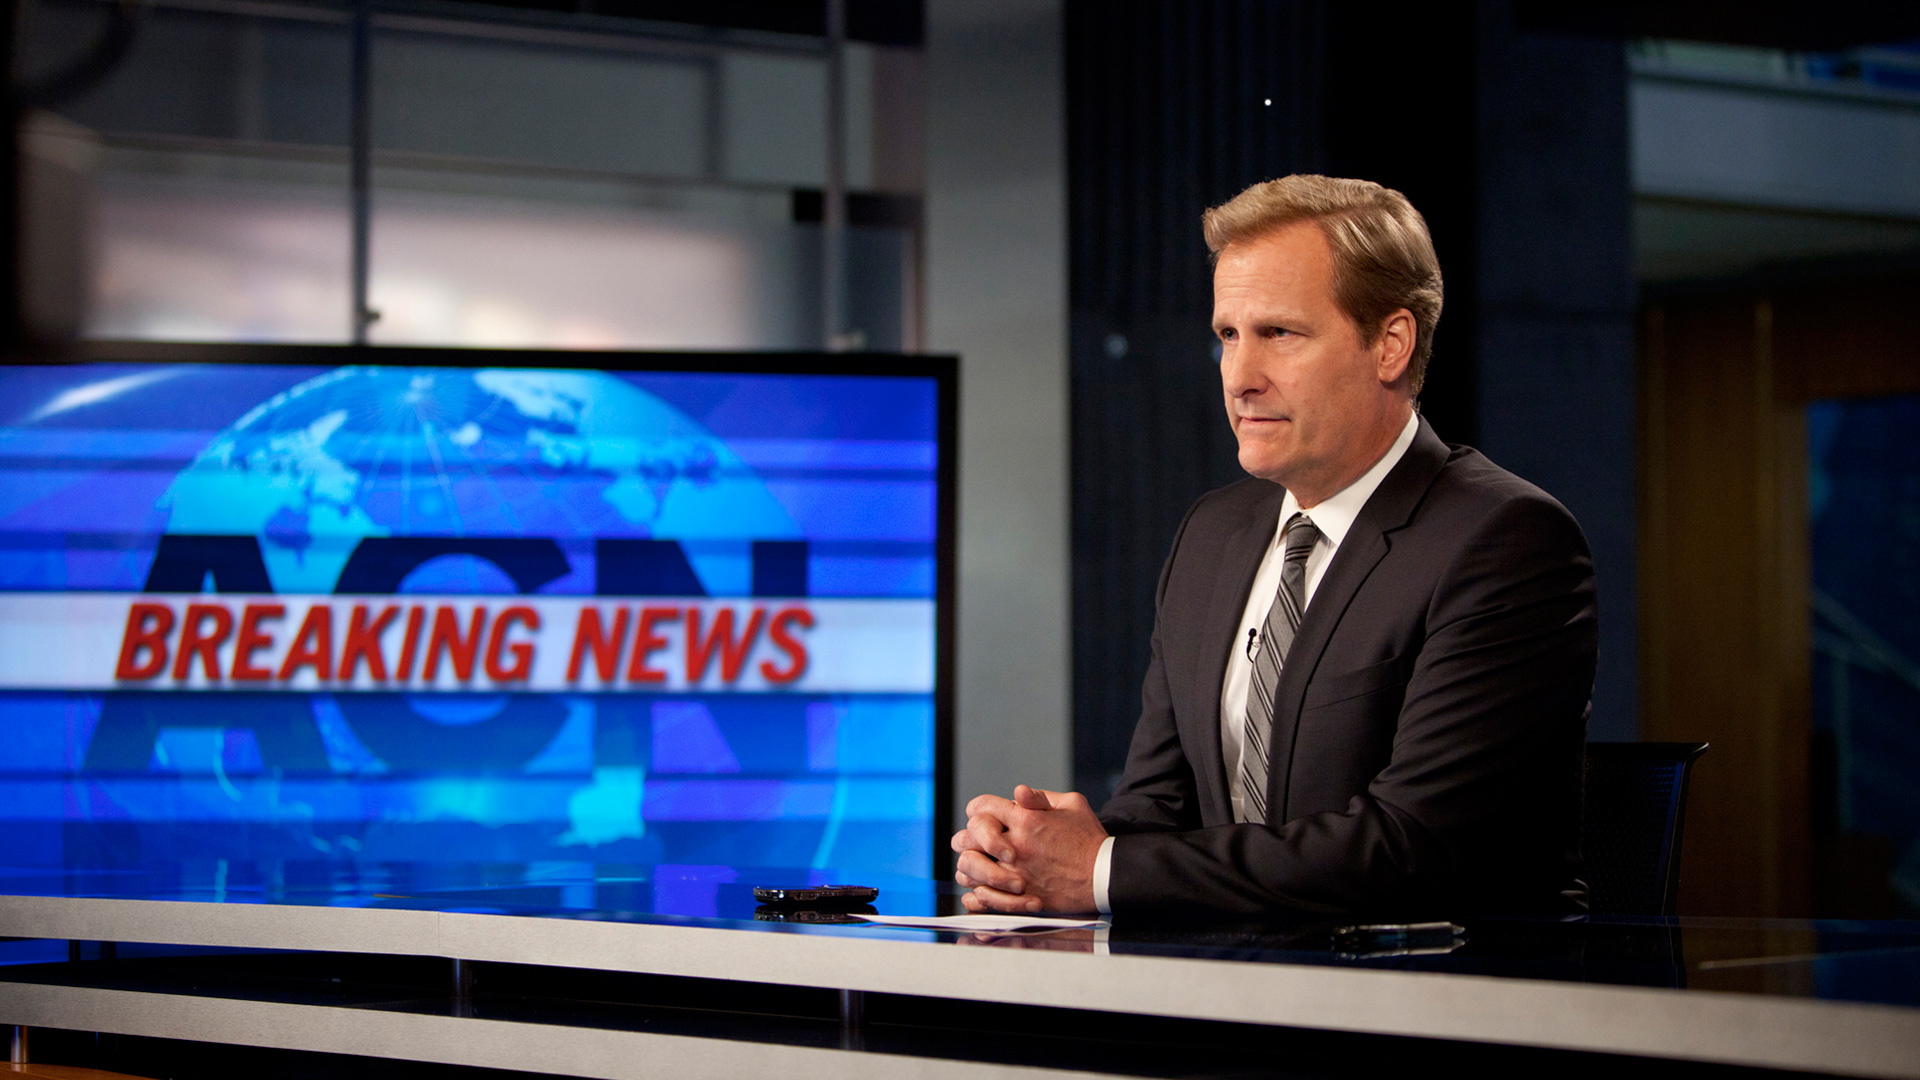 Harman Kardon Car Audio: The Newsroom (US)